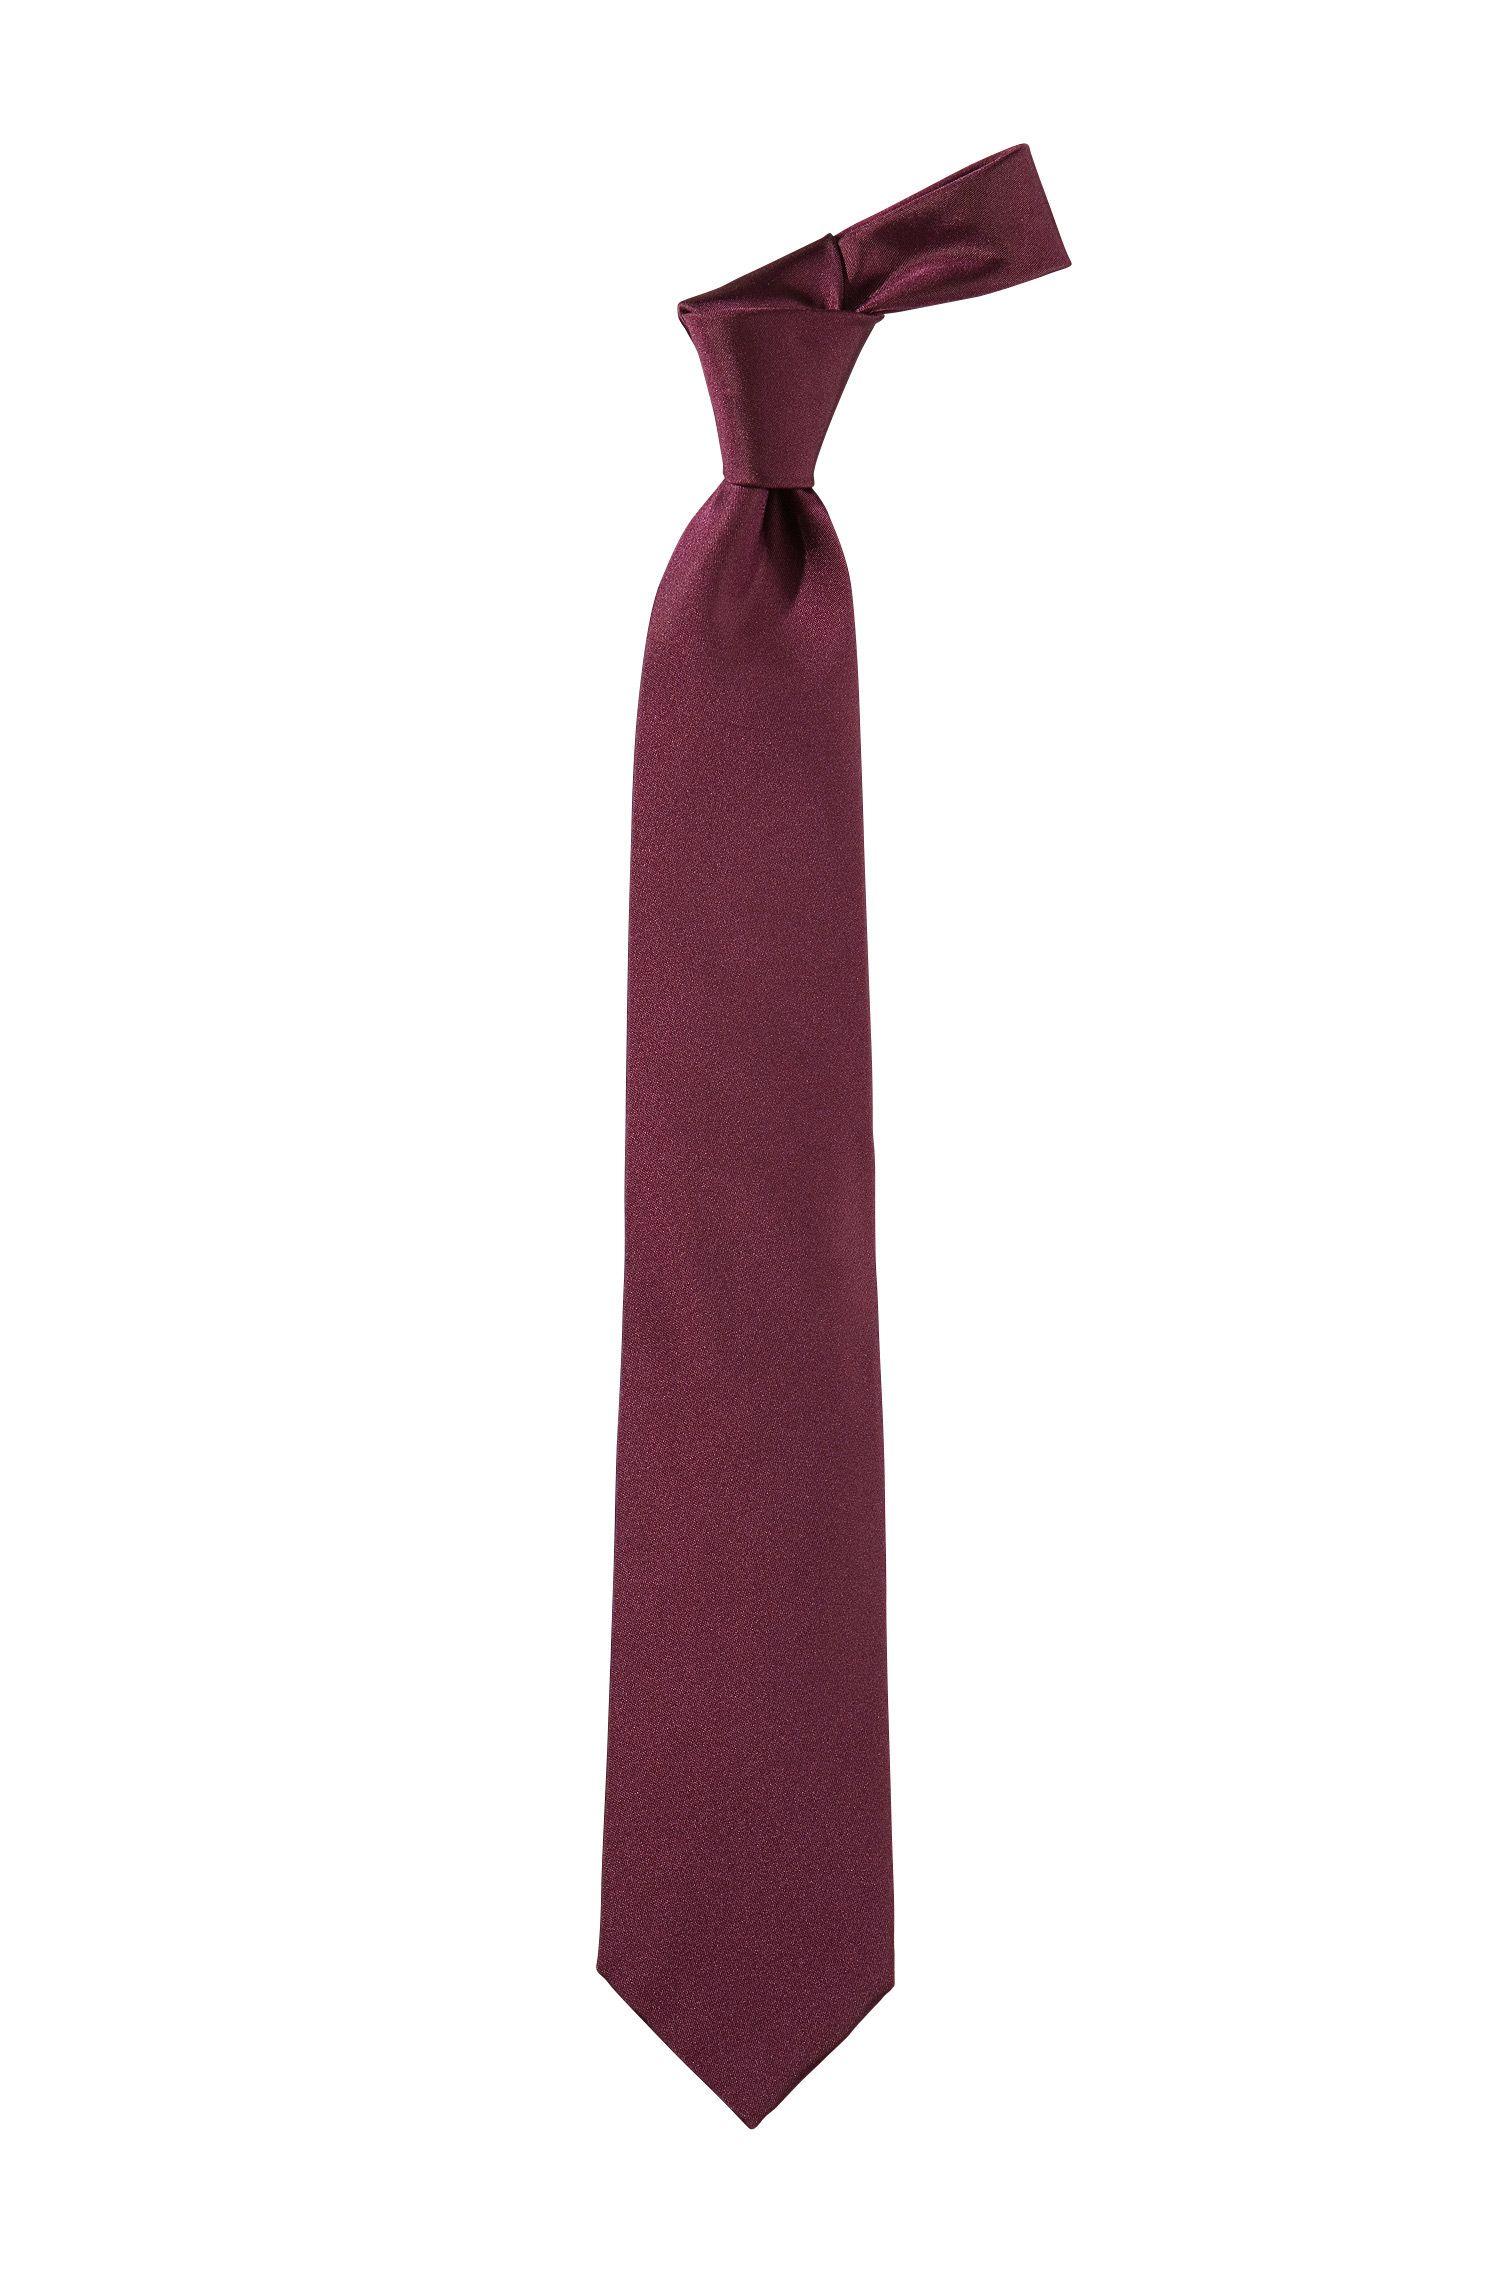 Cravate «Tie 7,5 cm» en soie